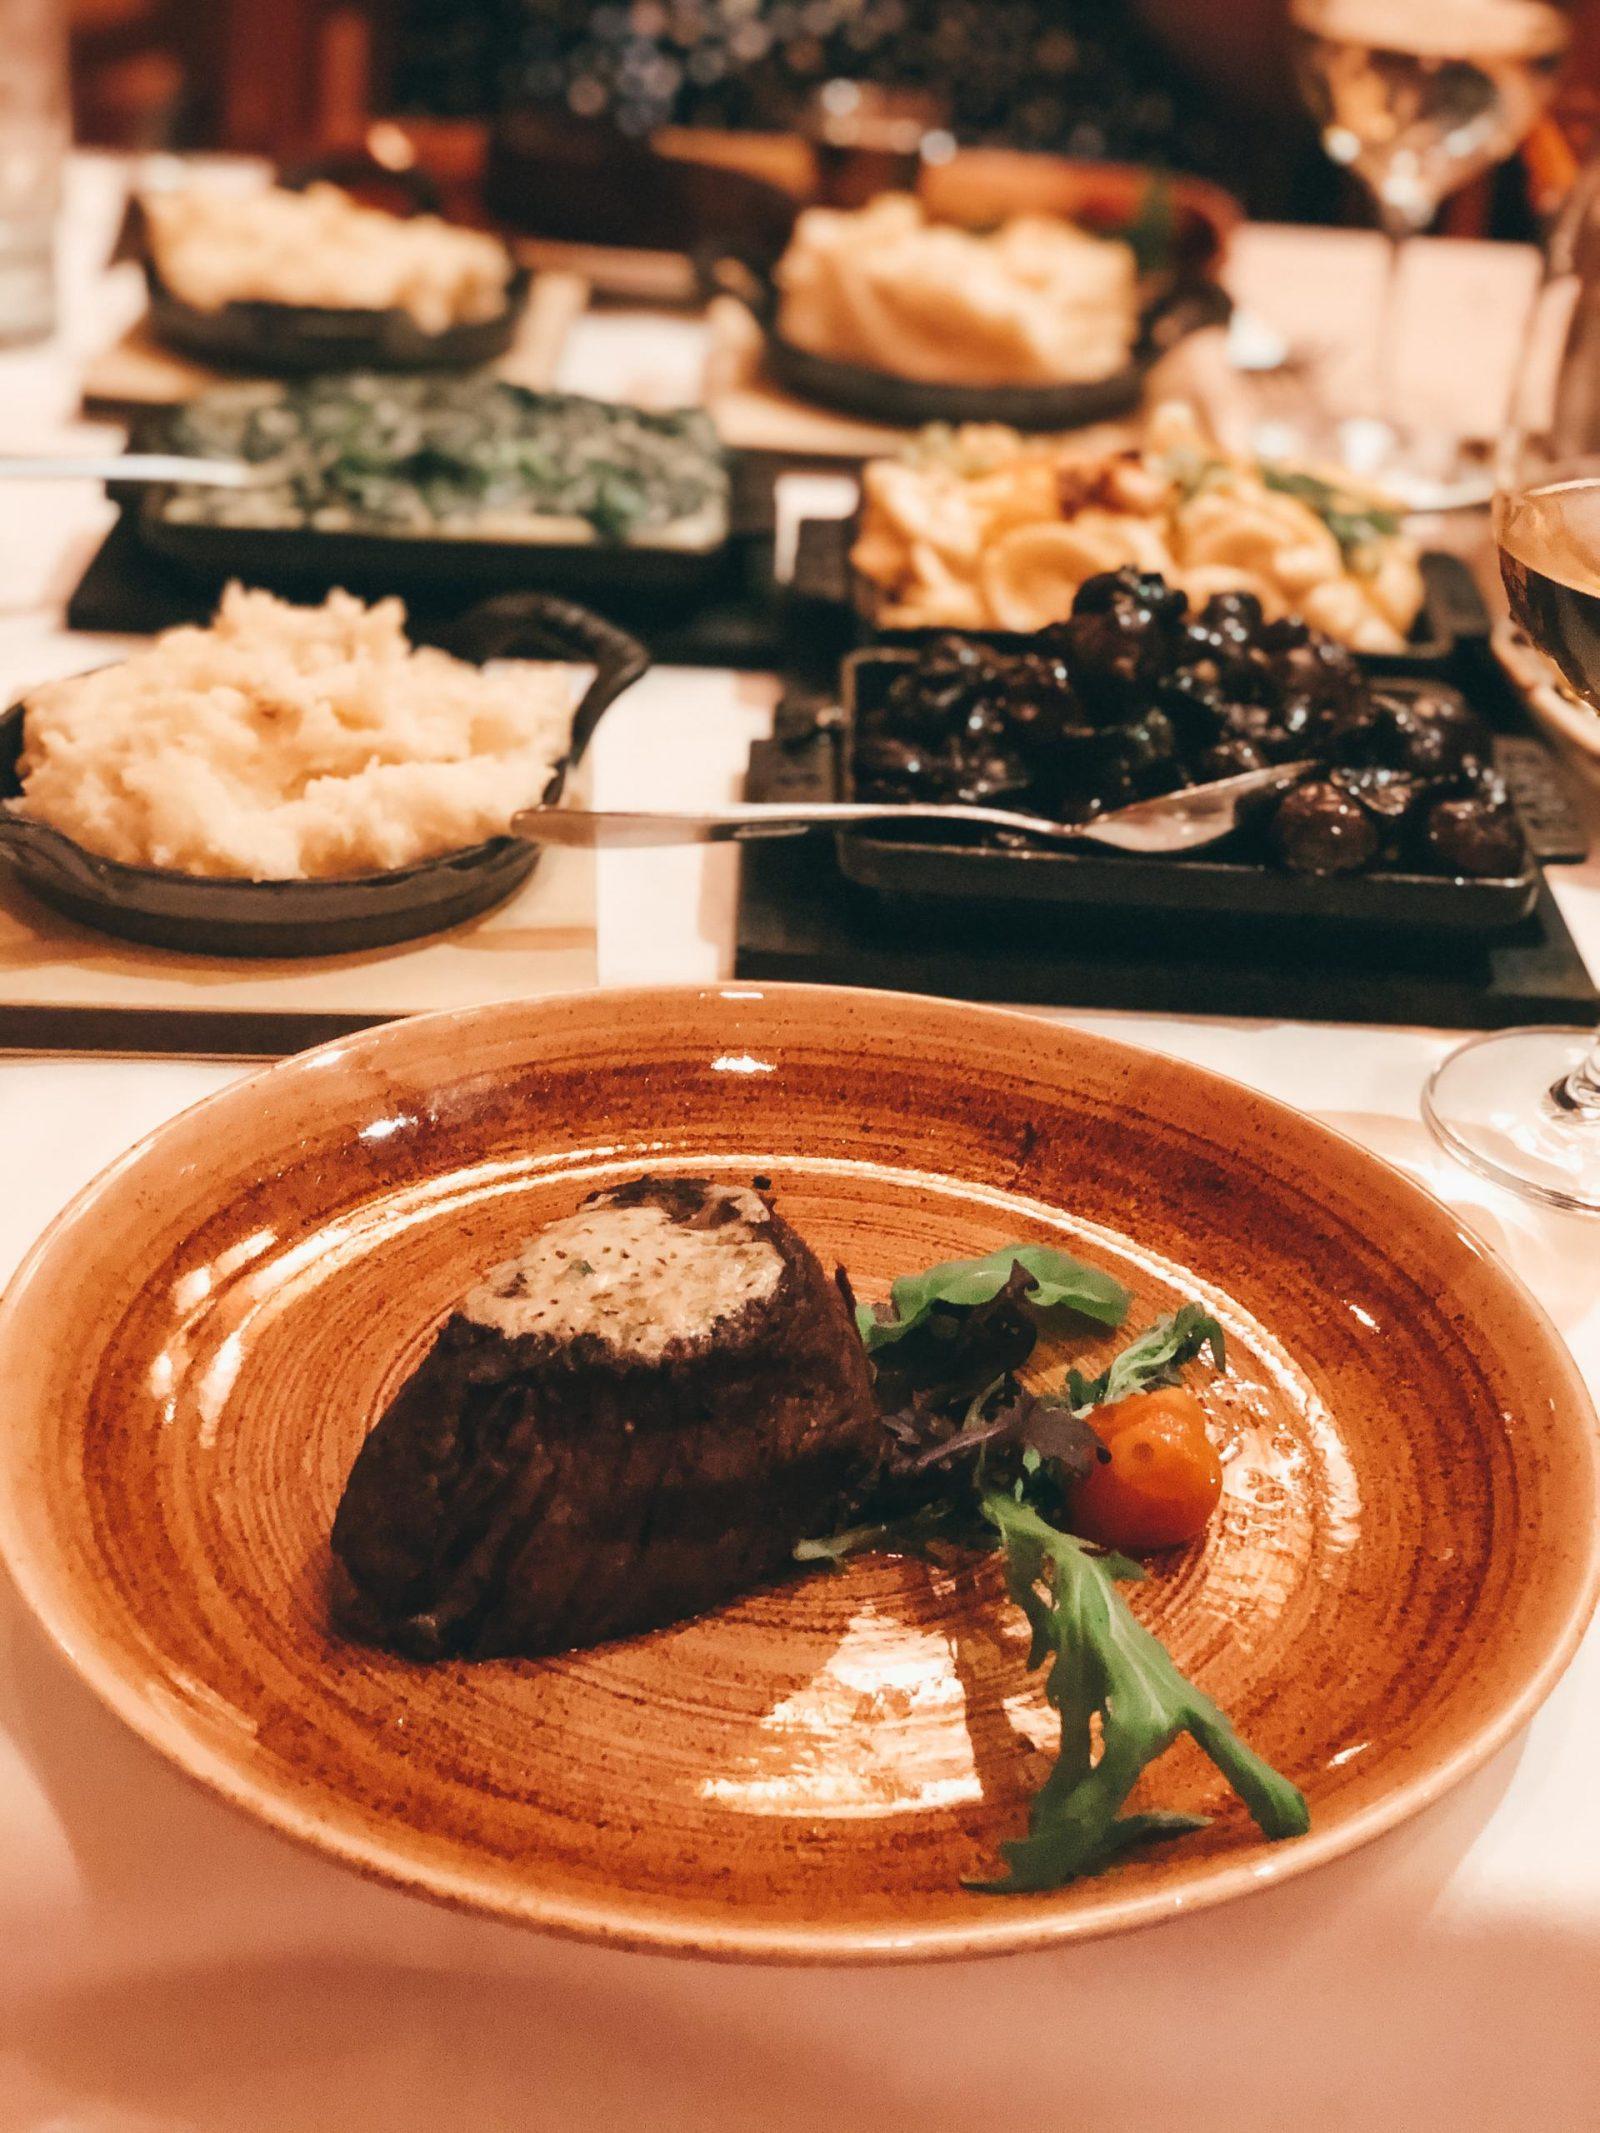 Dinner at Yachtsman Steakhouse - my Disney Bucket List